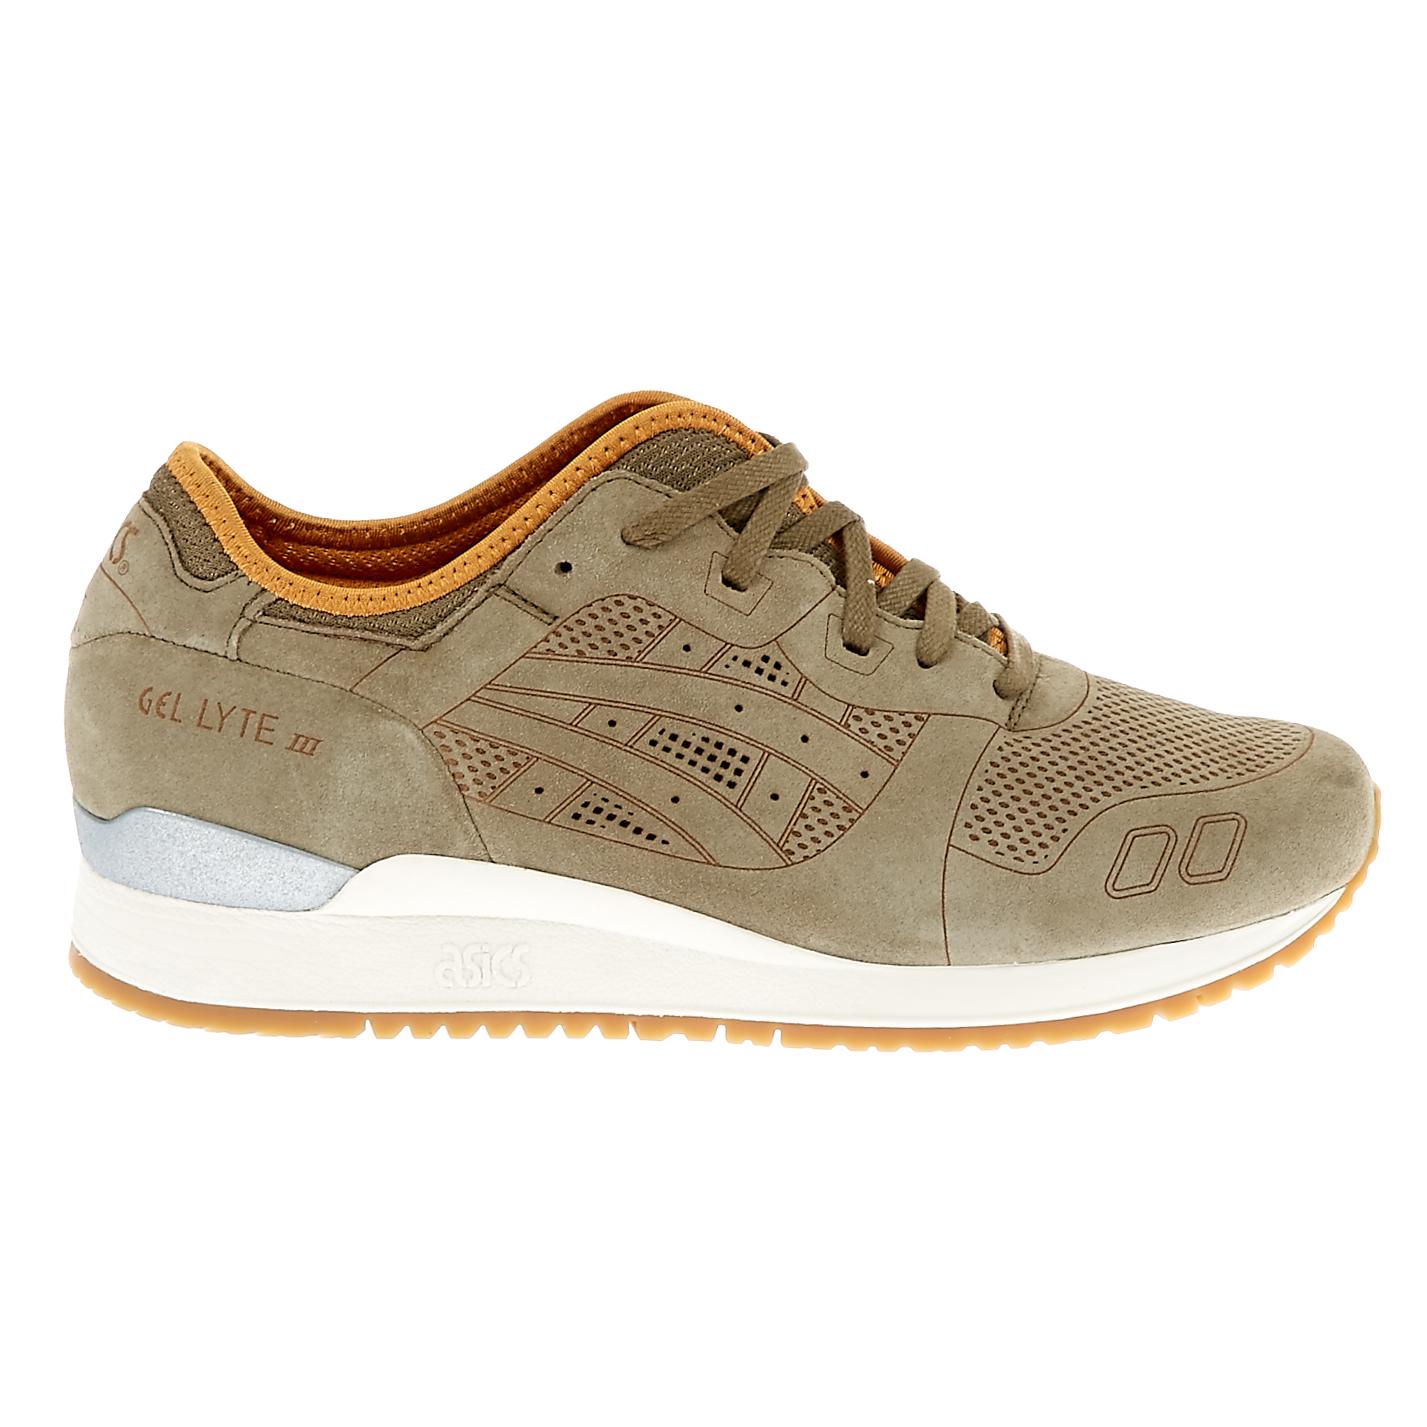 ASICS – Γυναικεία παπούτσια Asics GEL-LYTE III μπεζ